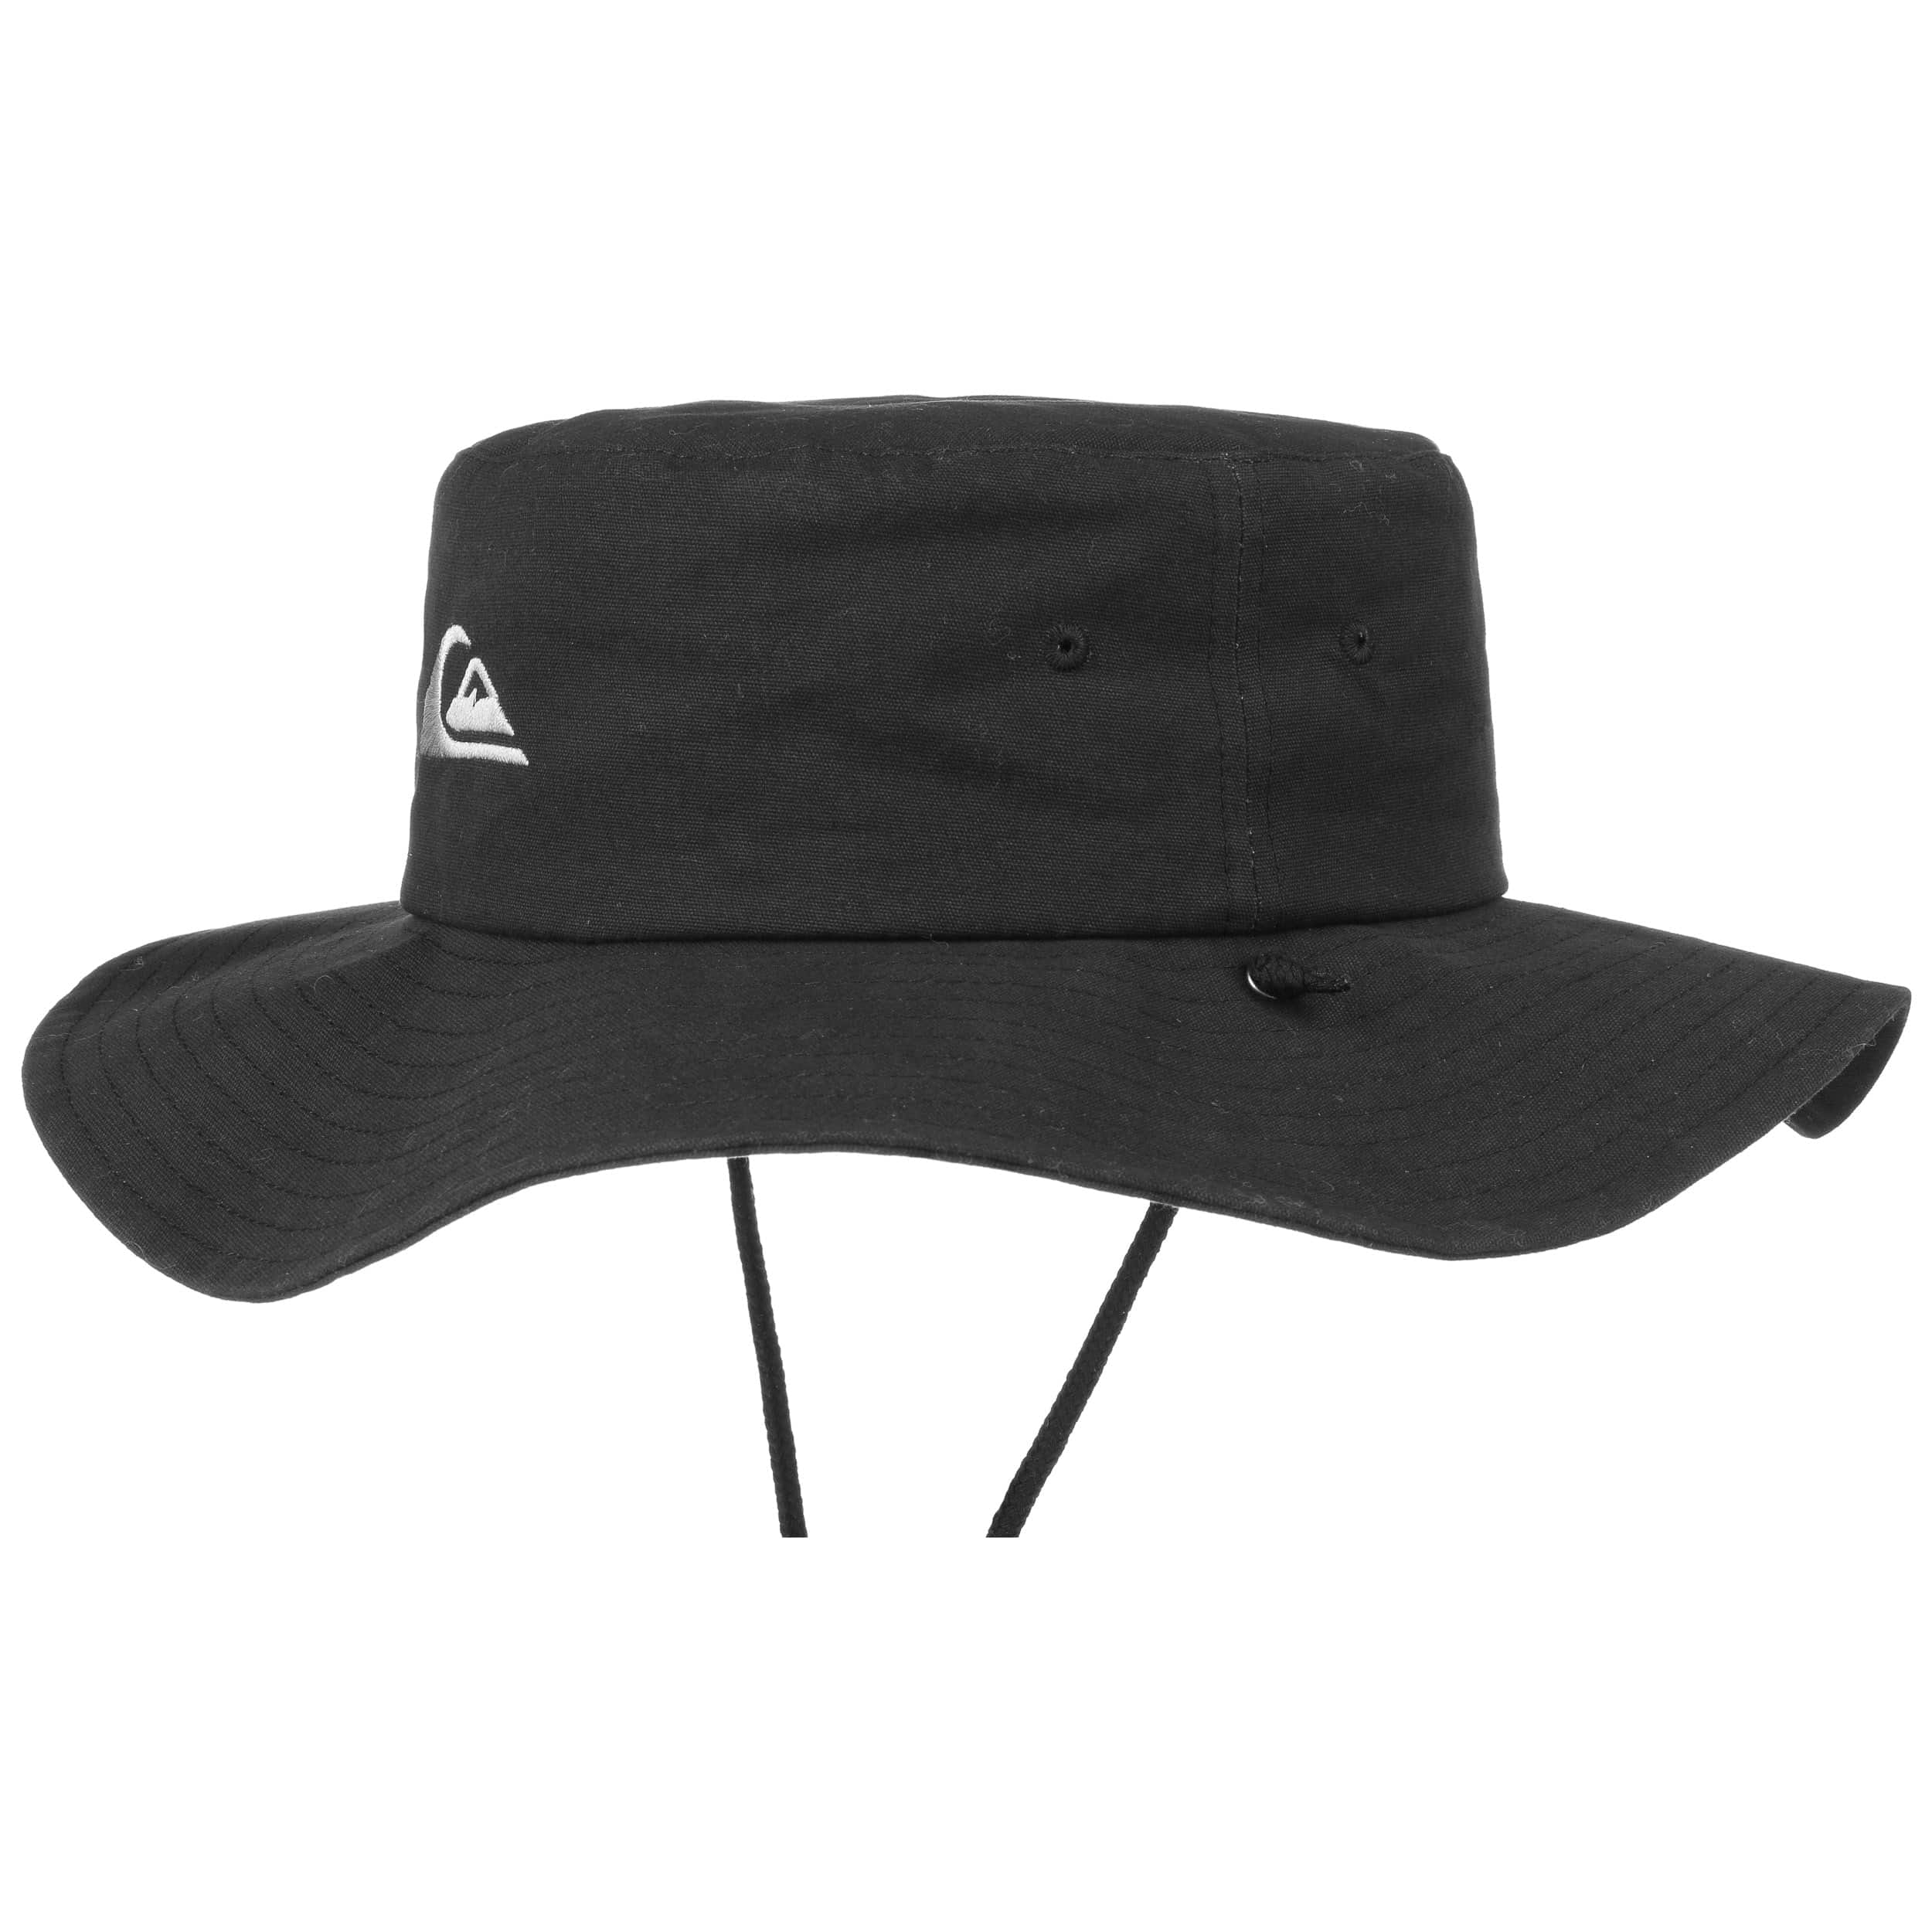 91e9c8ffb0bdd ... clearance purchase bushmaster bucket hat by quiksilver 6 83e36 a8993  fe9cf 924fc